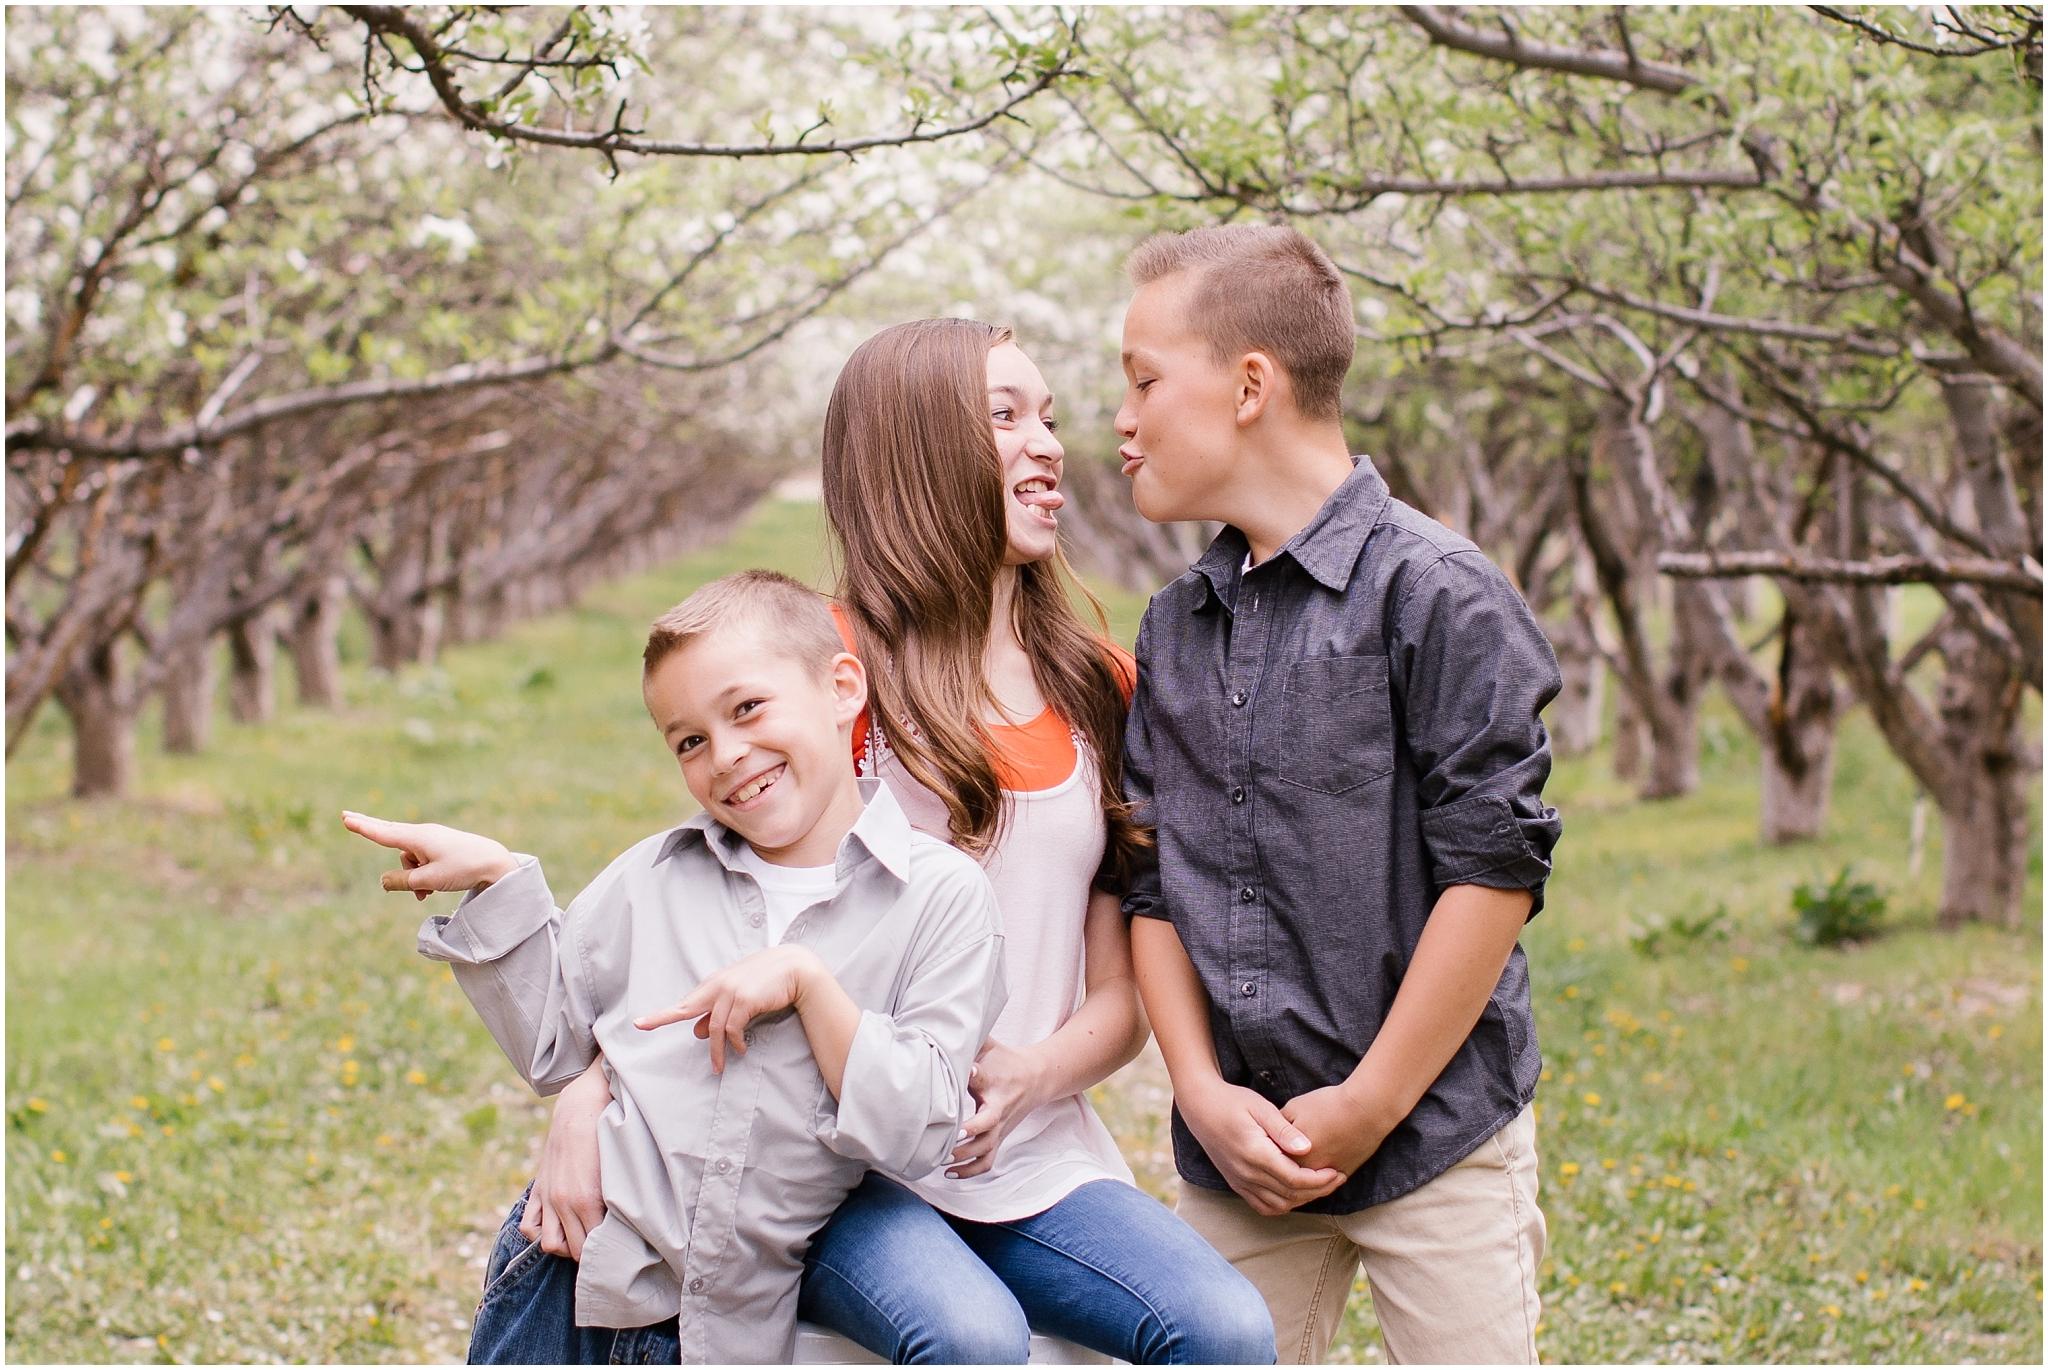 Millar-136_Lizzie-B-Imagery-Utah-Family-Photographer-Salt-Lake-City-Park-City-utah-state-hospital.jpg